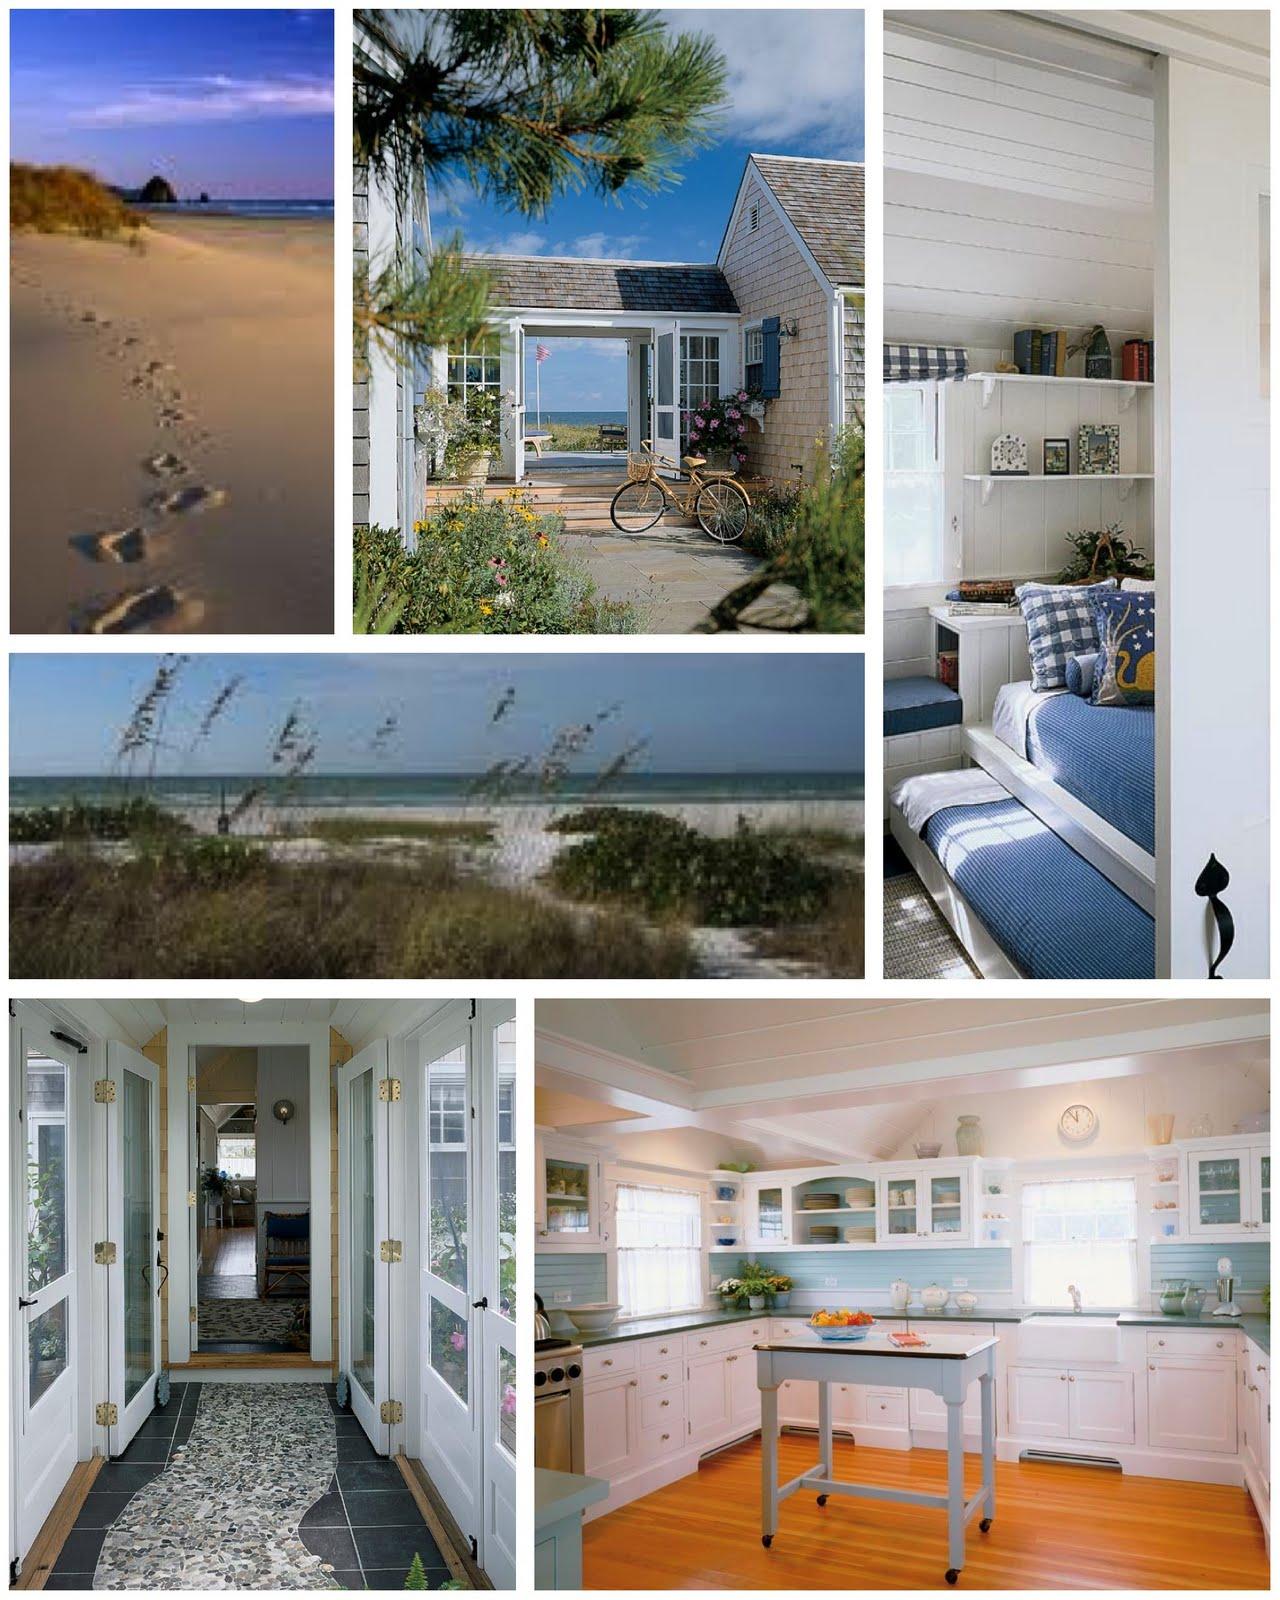 http://4.bp.blogspot.com/-9j3iFfc1mTs/TdrAwY4Q9aI/AAAAAAAACBc/p5s6LHok0qQ/s1600/beach+house+style.jpg